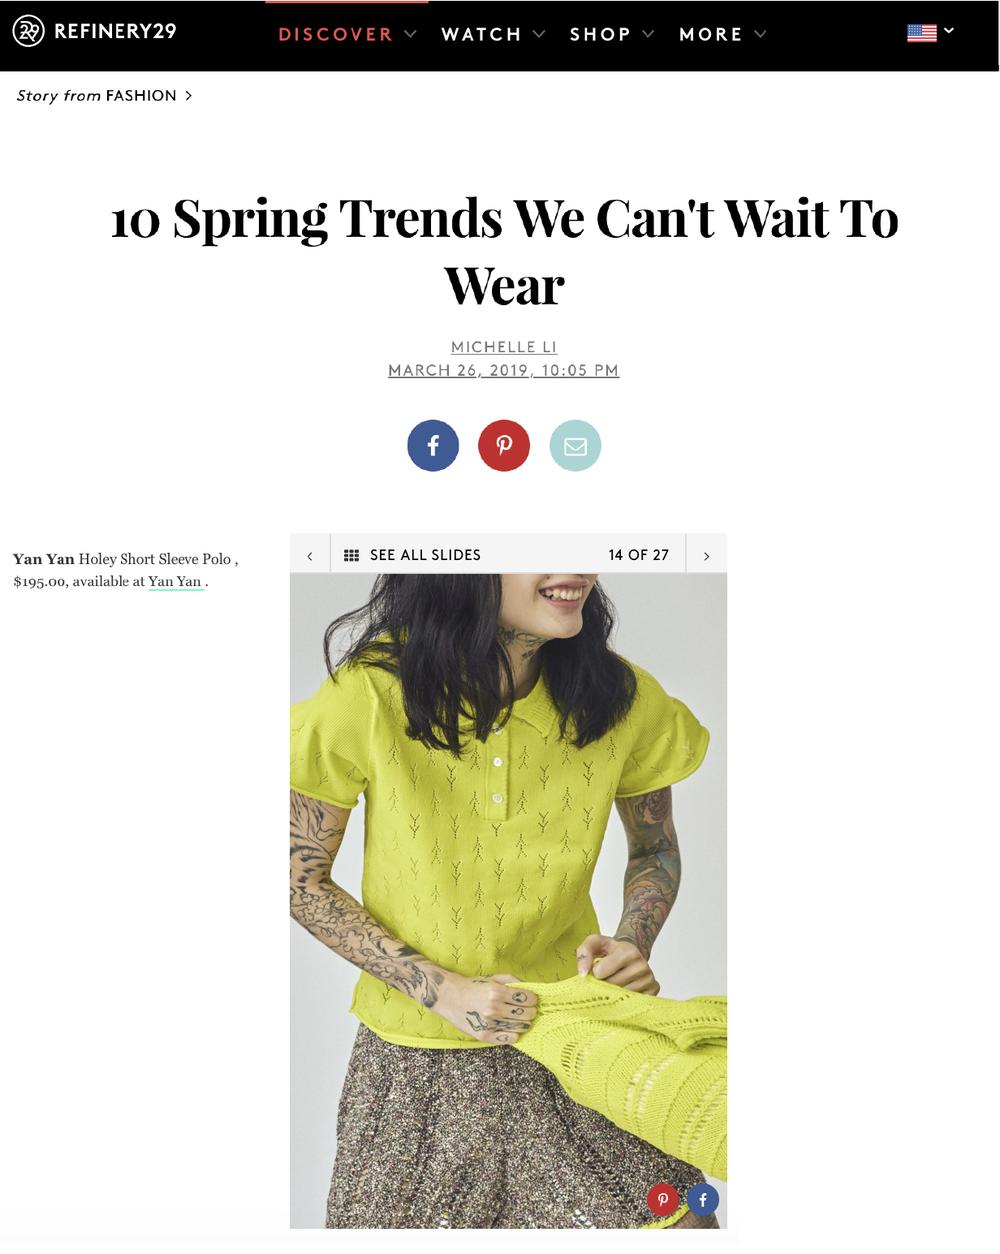 https://www.refinery29.com/en-us/spring-trends-to-shop-2019#slide-14